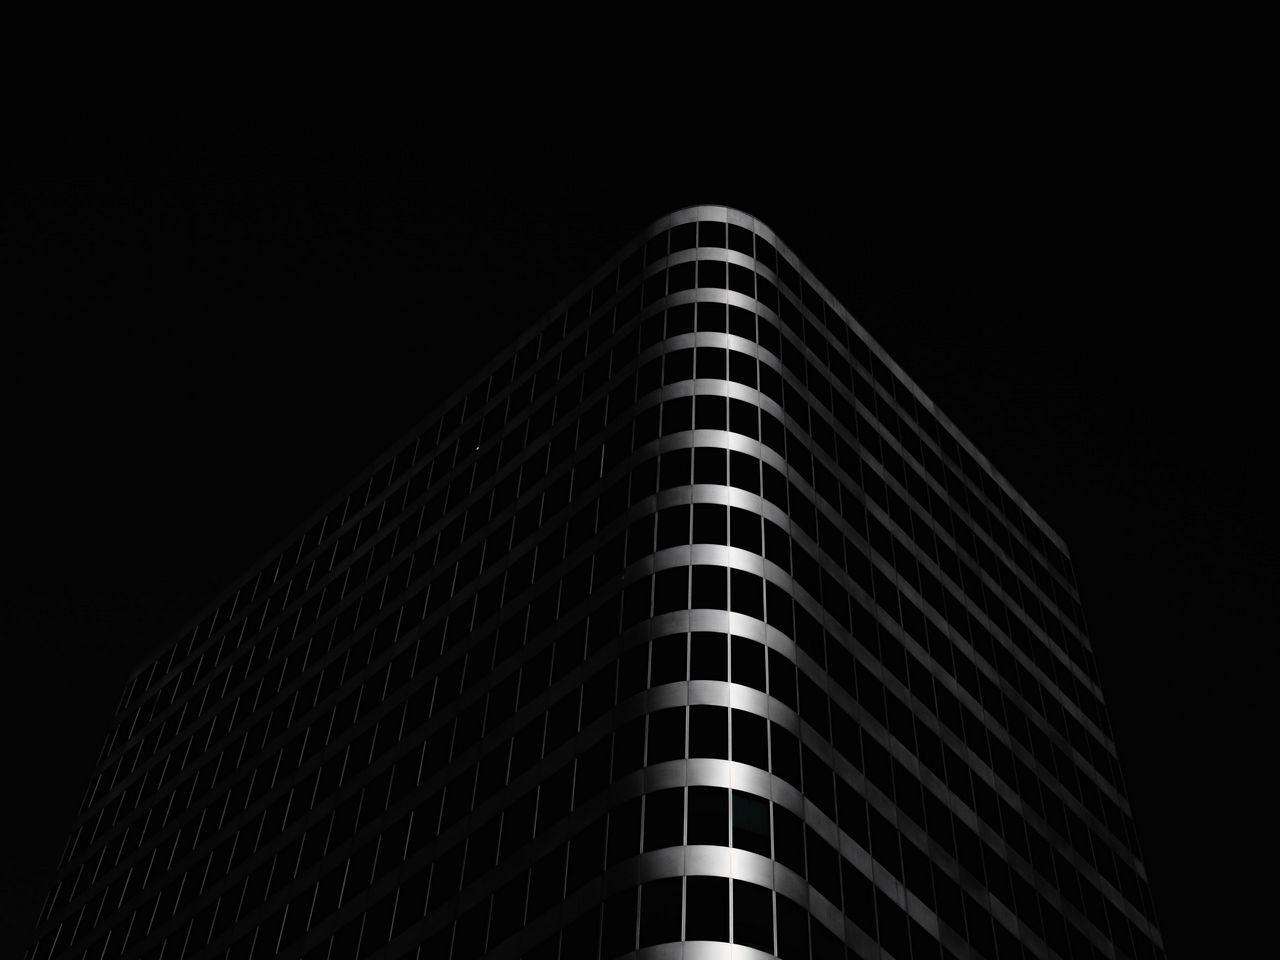 1280x960 Wallpaper building, architecture, black, dark